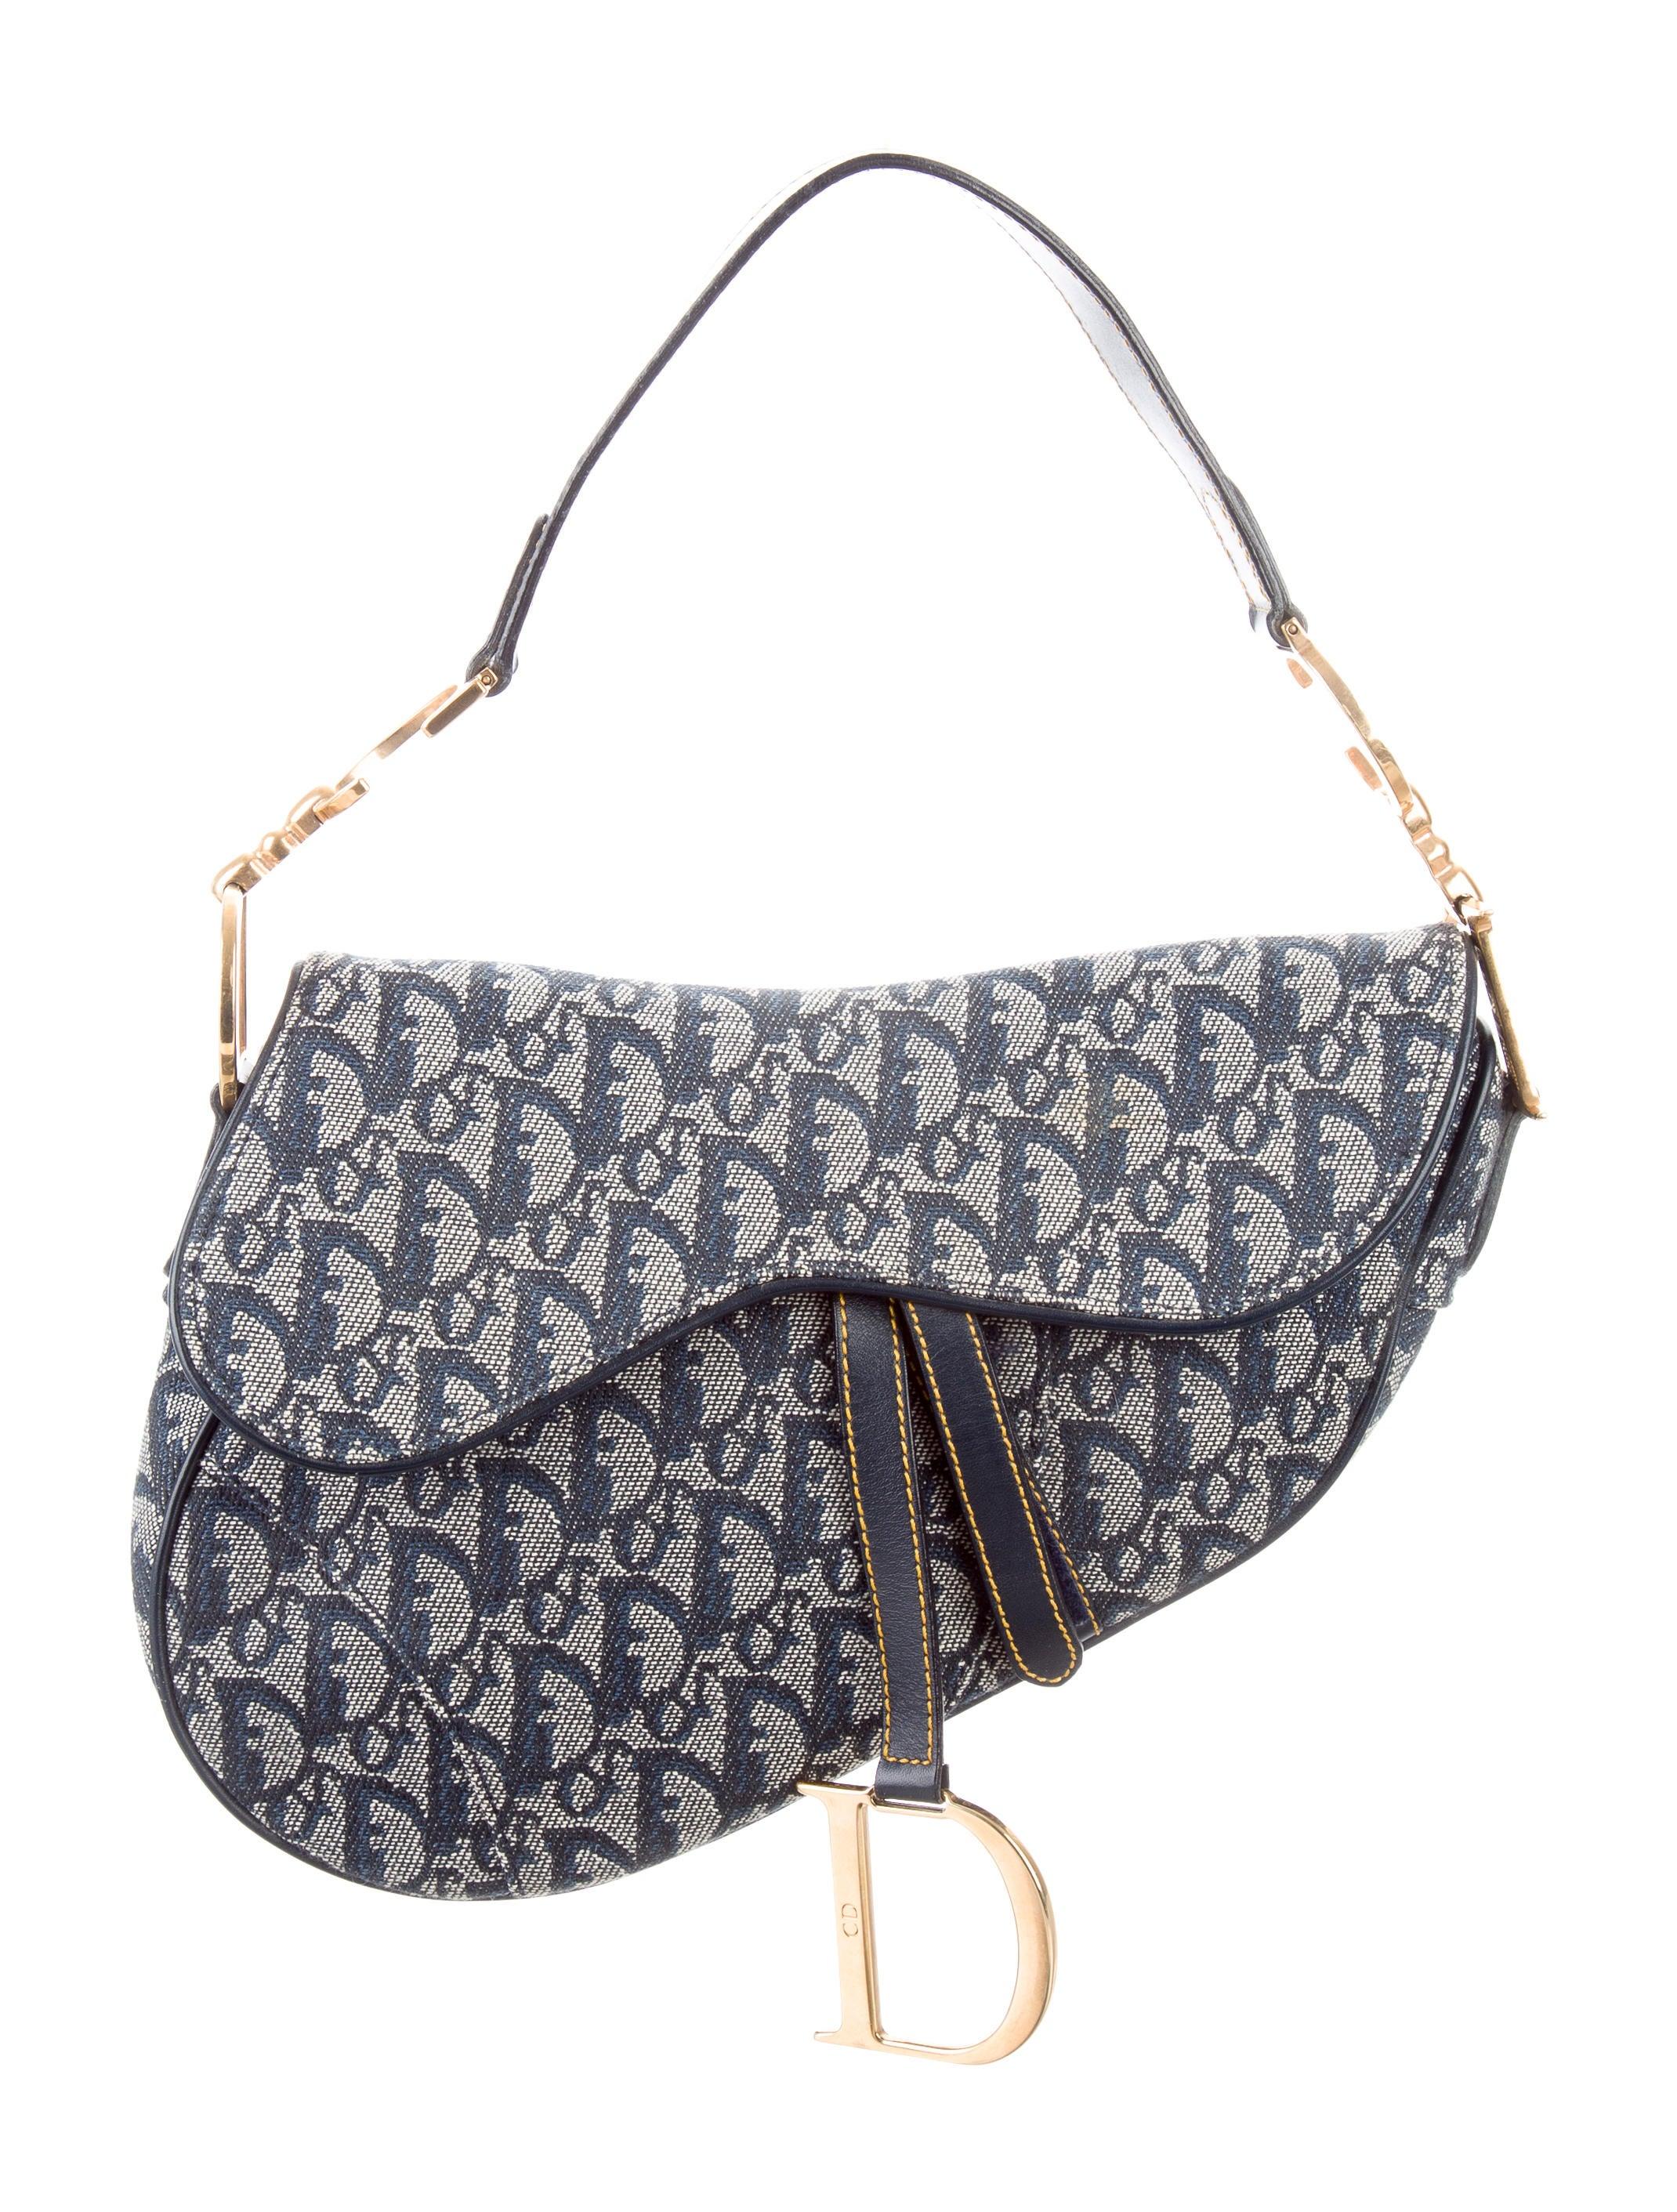 Christian dior diorissimo saddle bag handbags chr jpg 2140x2823 Authentic  christian dior saddle bag 25d85dcf91ac7